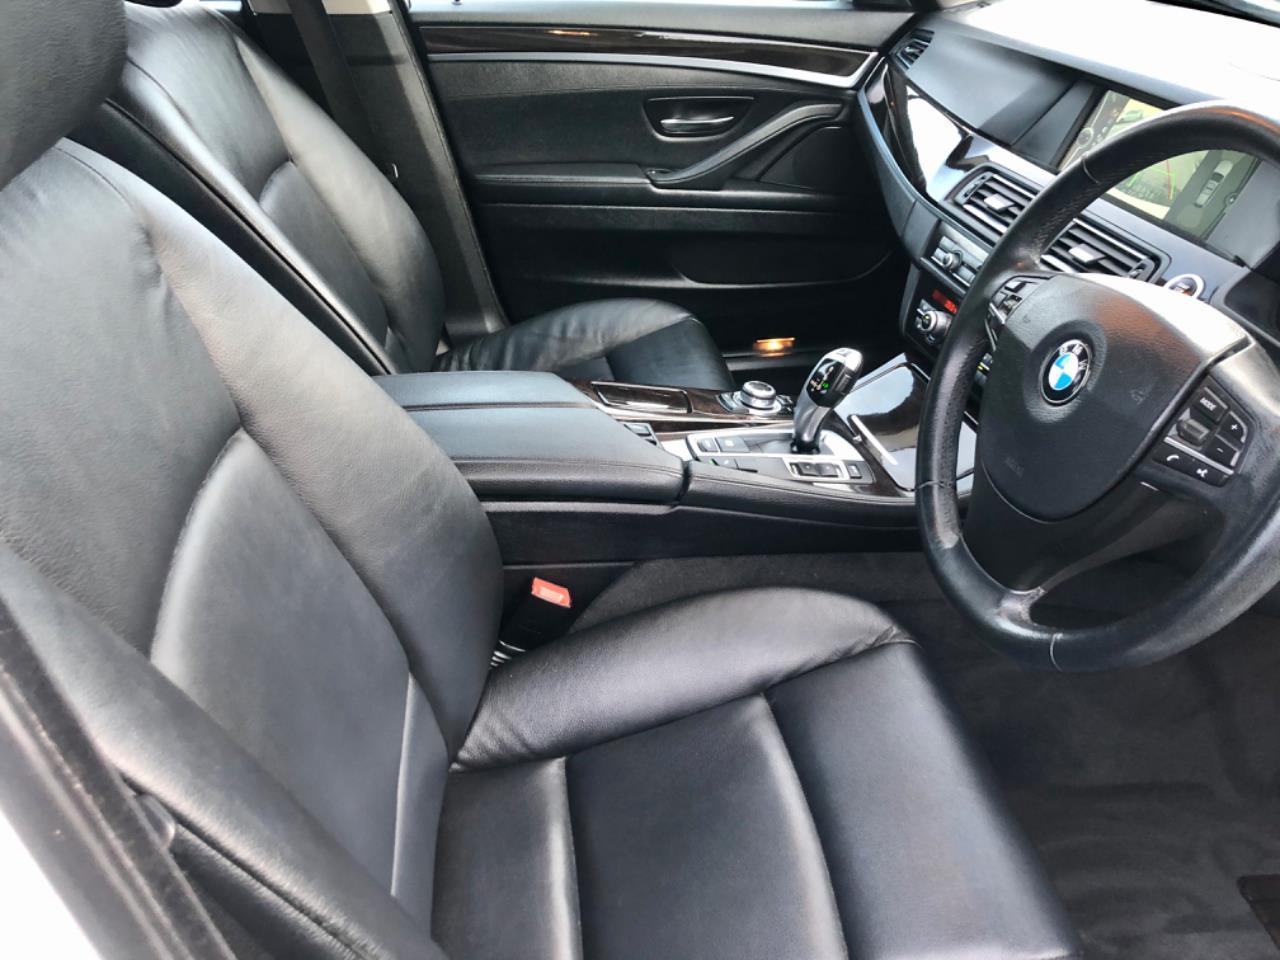 image-9, 2011 BMW 523i at Christchurch